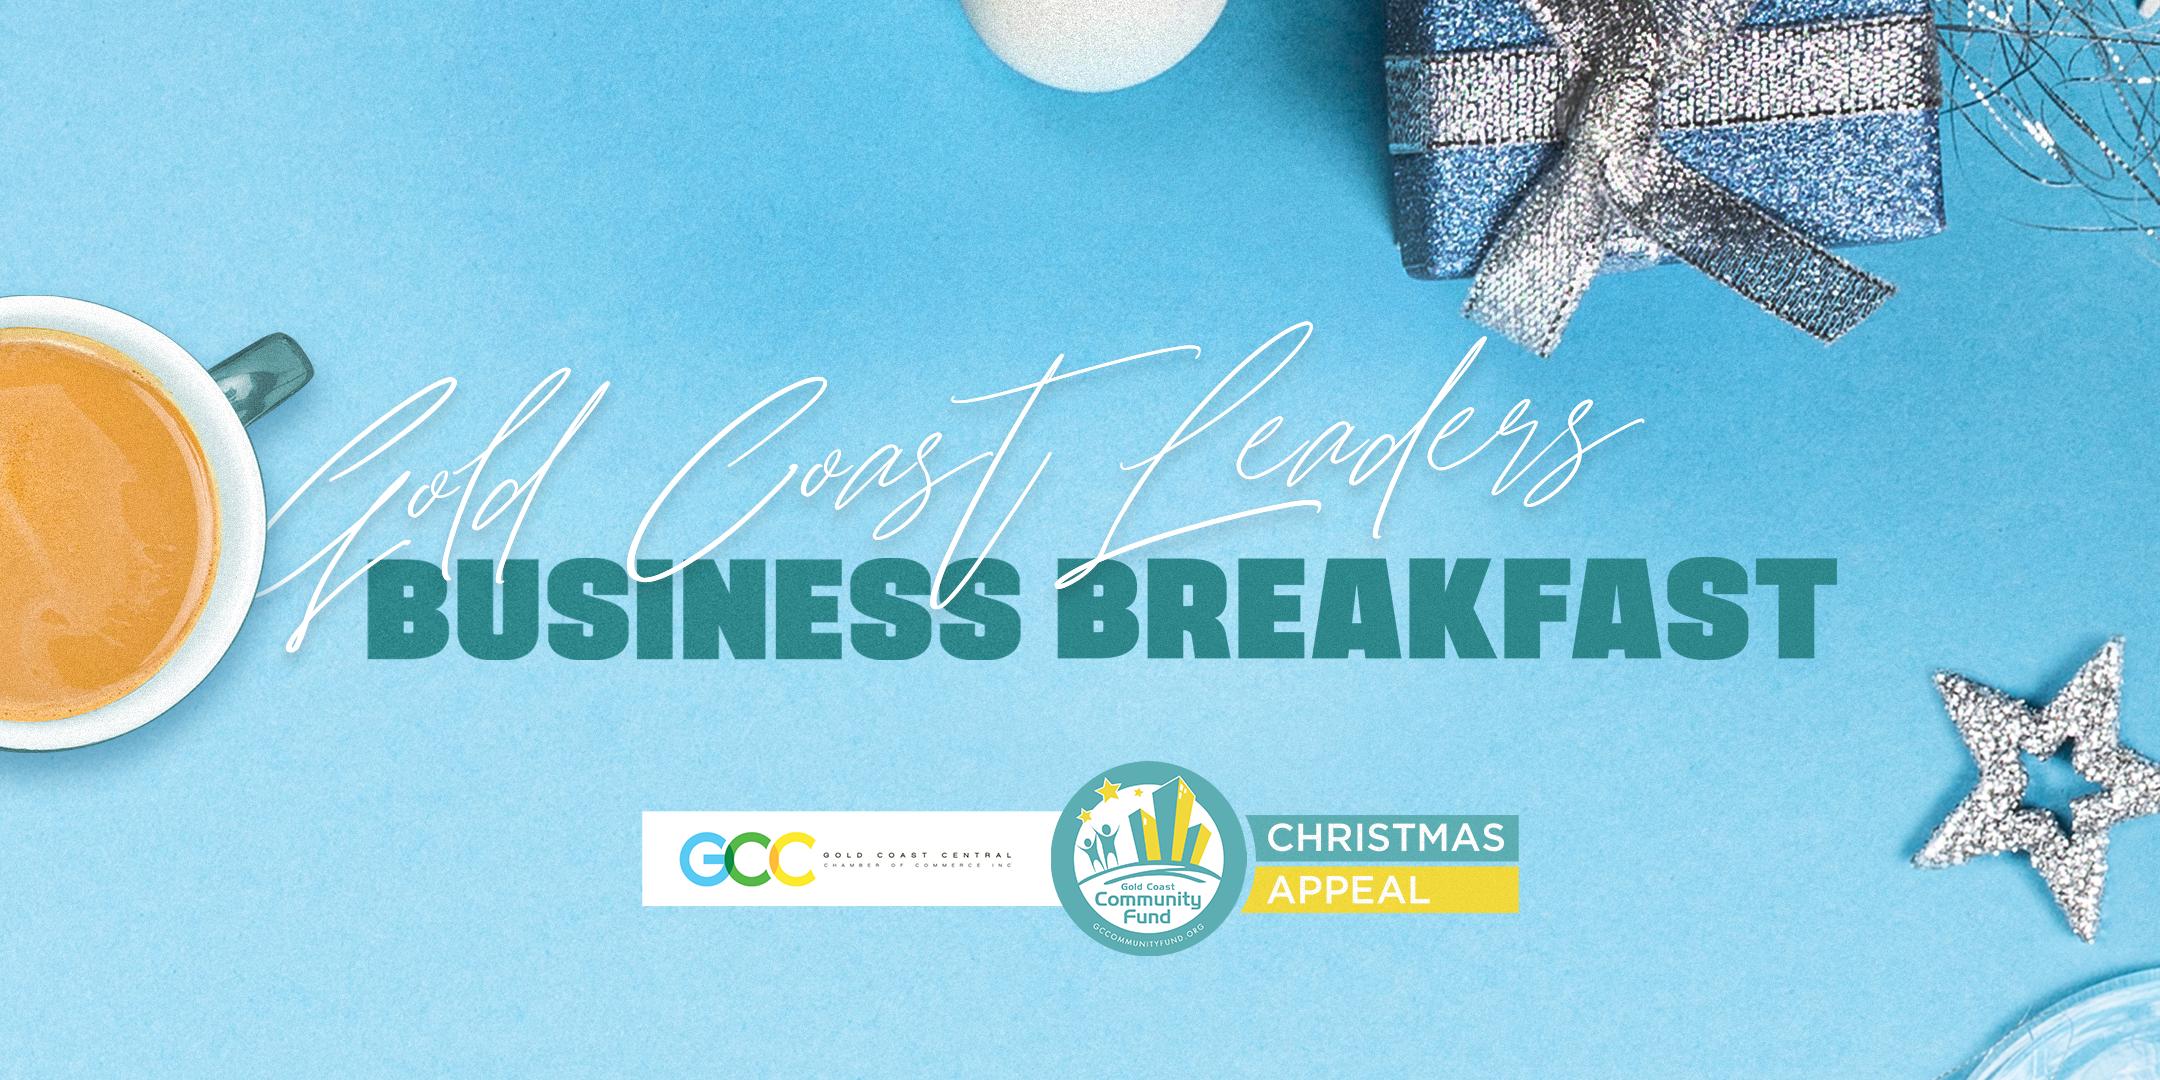 Gold Coast Leaders Business Breakfast 2021